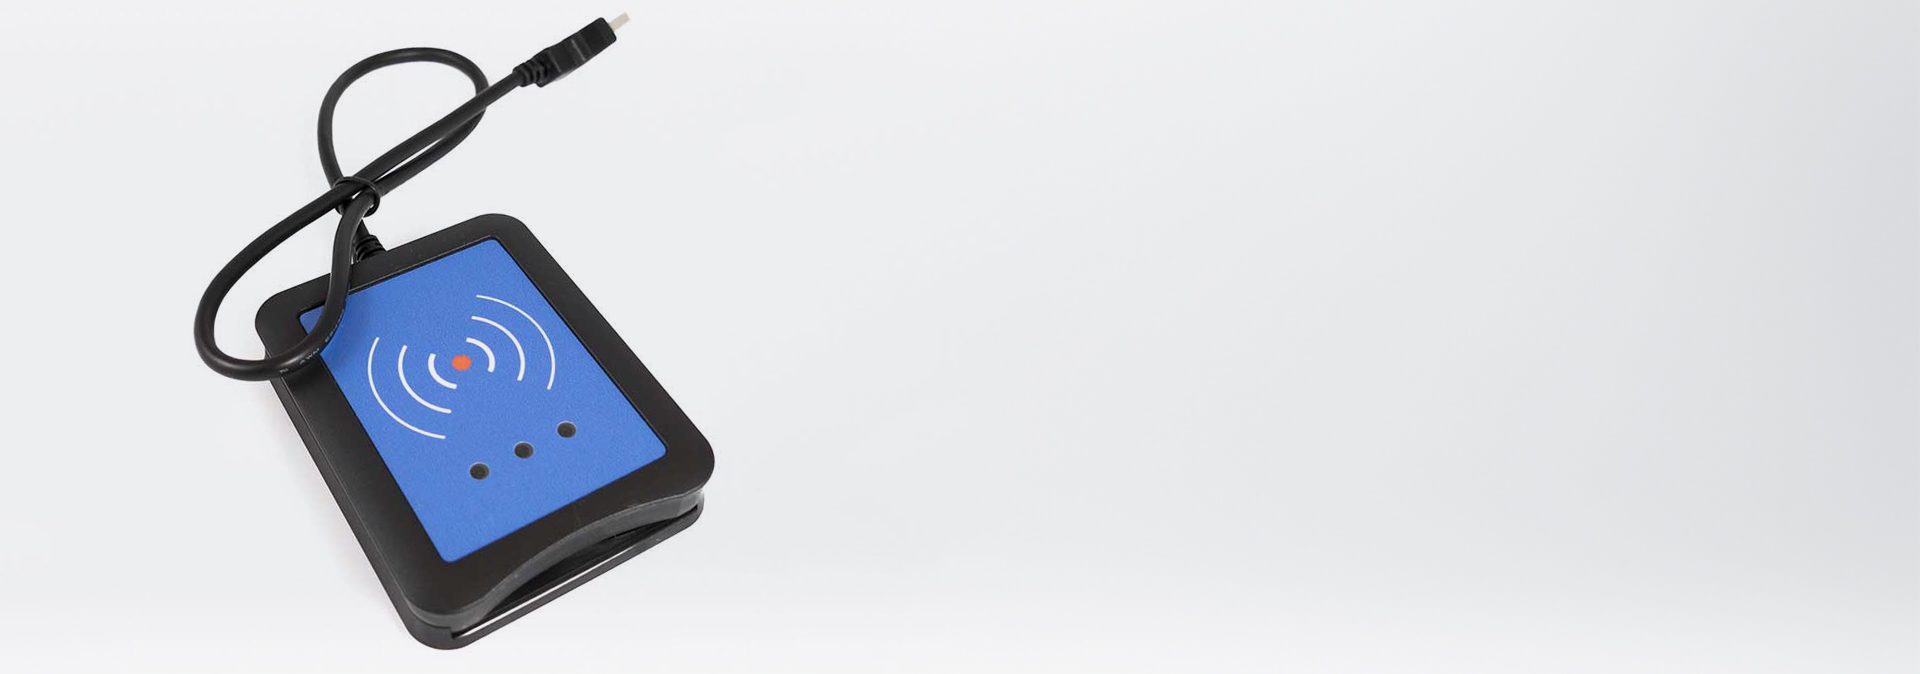 Elatec TWN4 MultiTech SmartCard